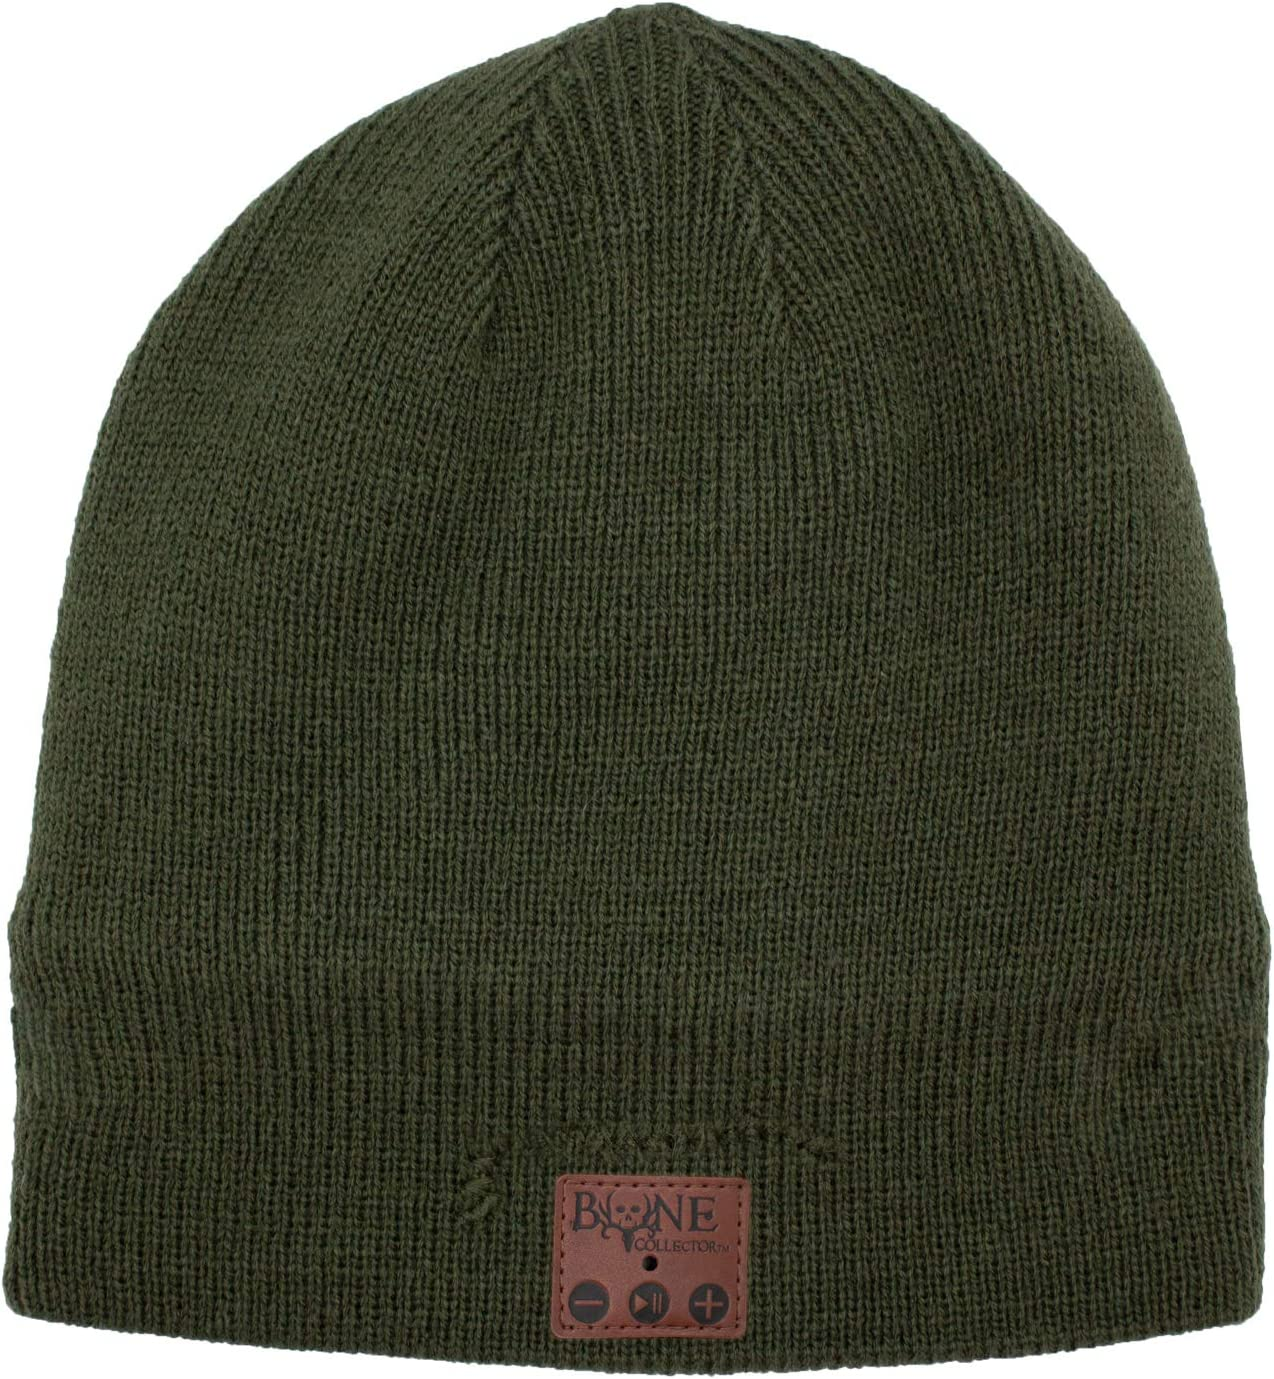 Bluetooth Beanie Hat, Evergreen, Listen to Music, Stay Warm, Hands-Free, Bone Collector